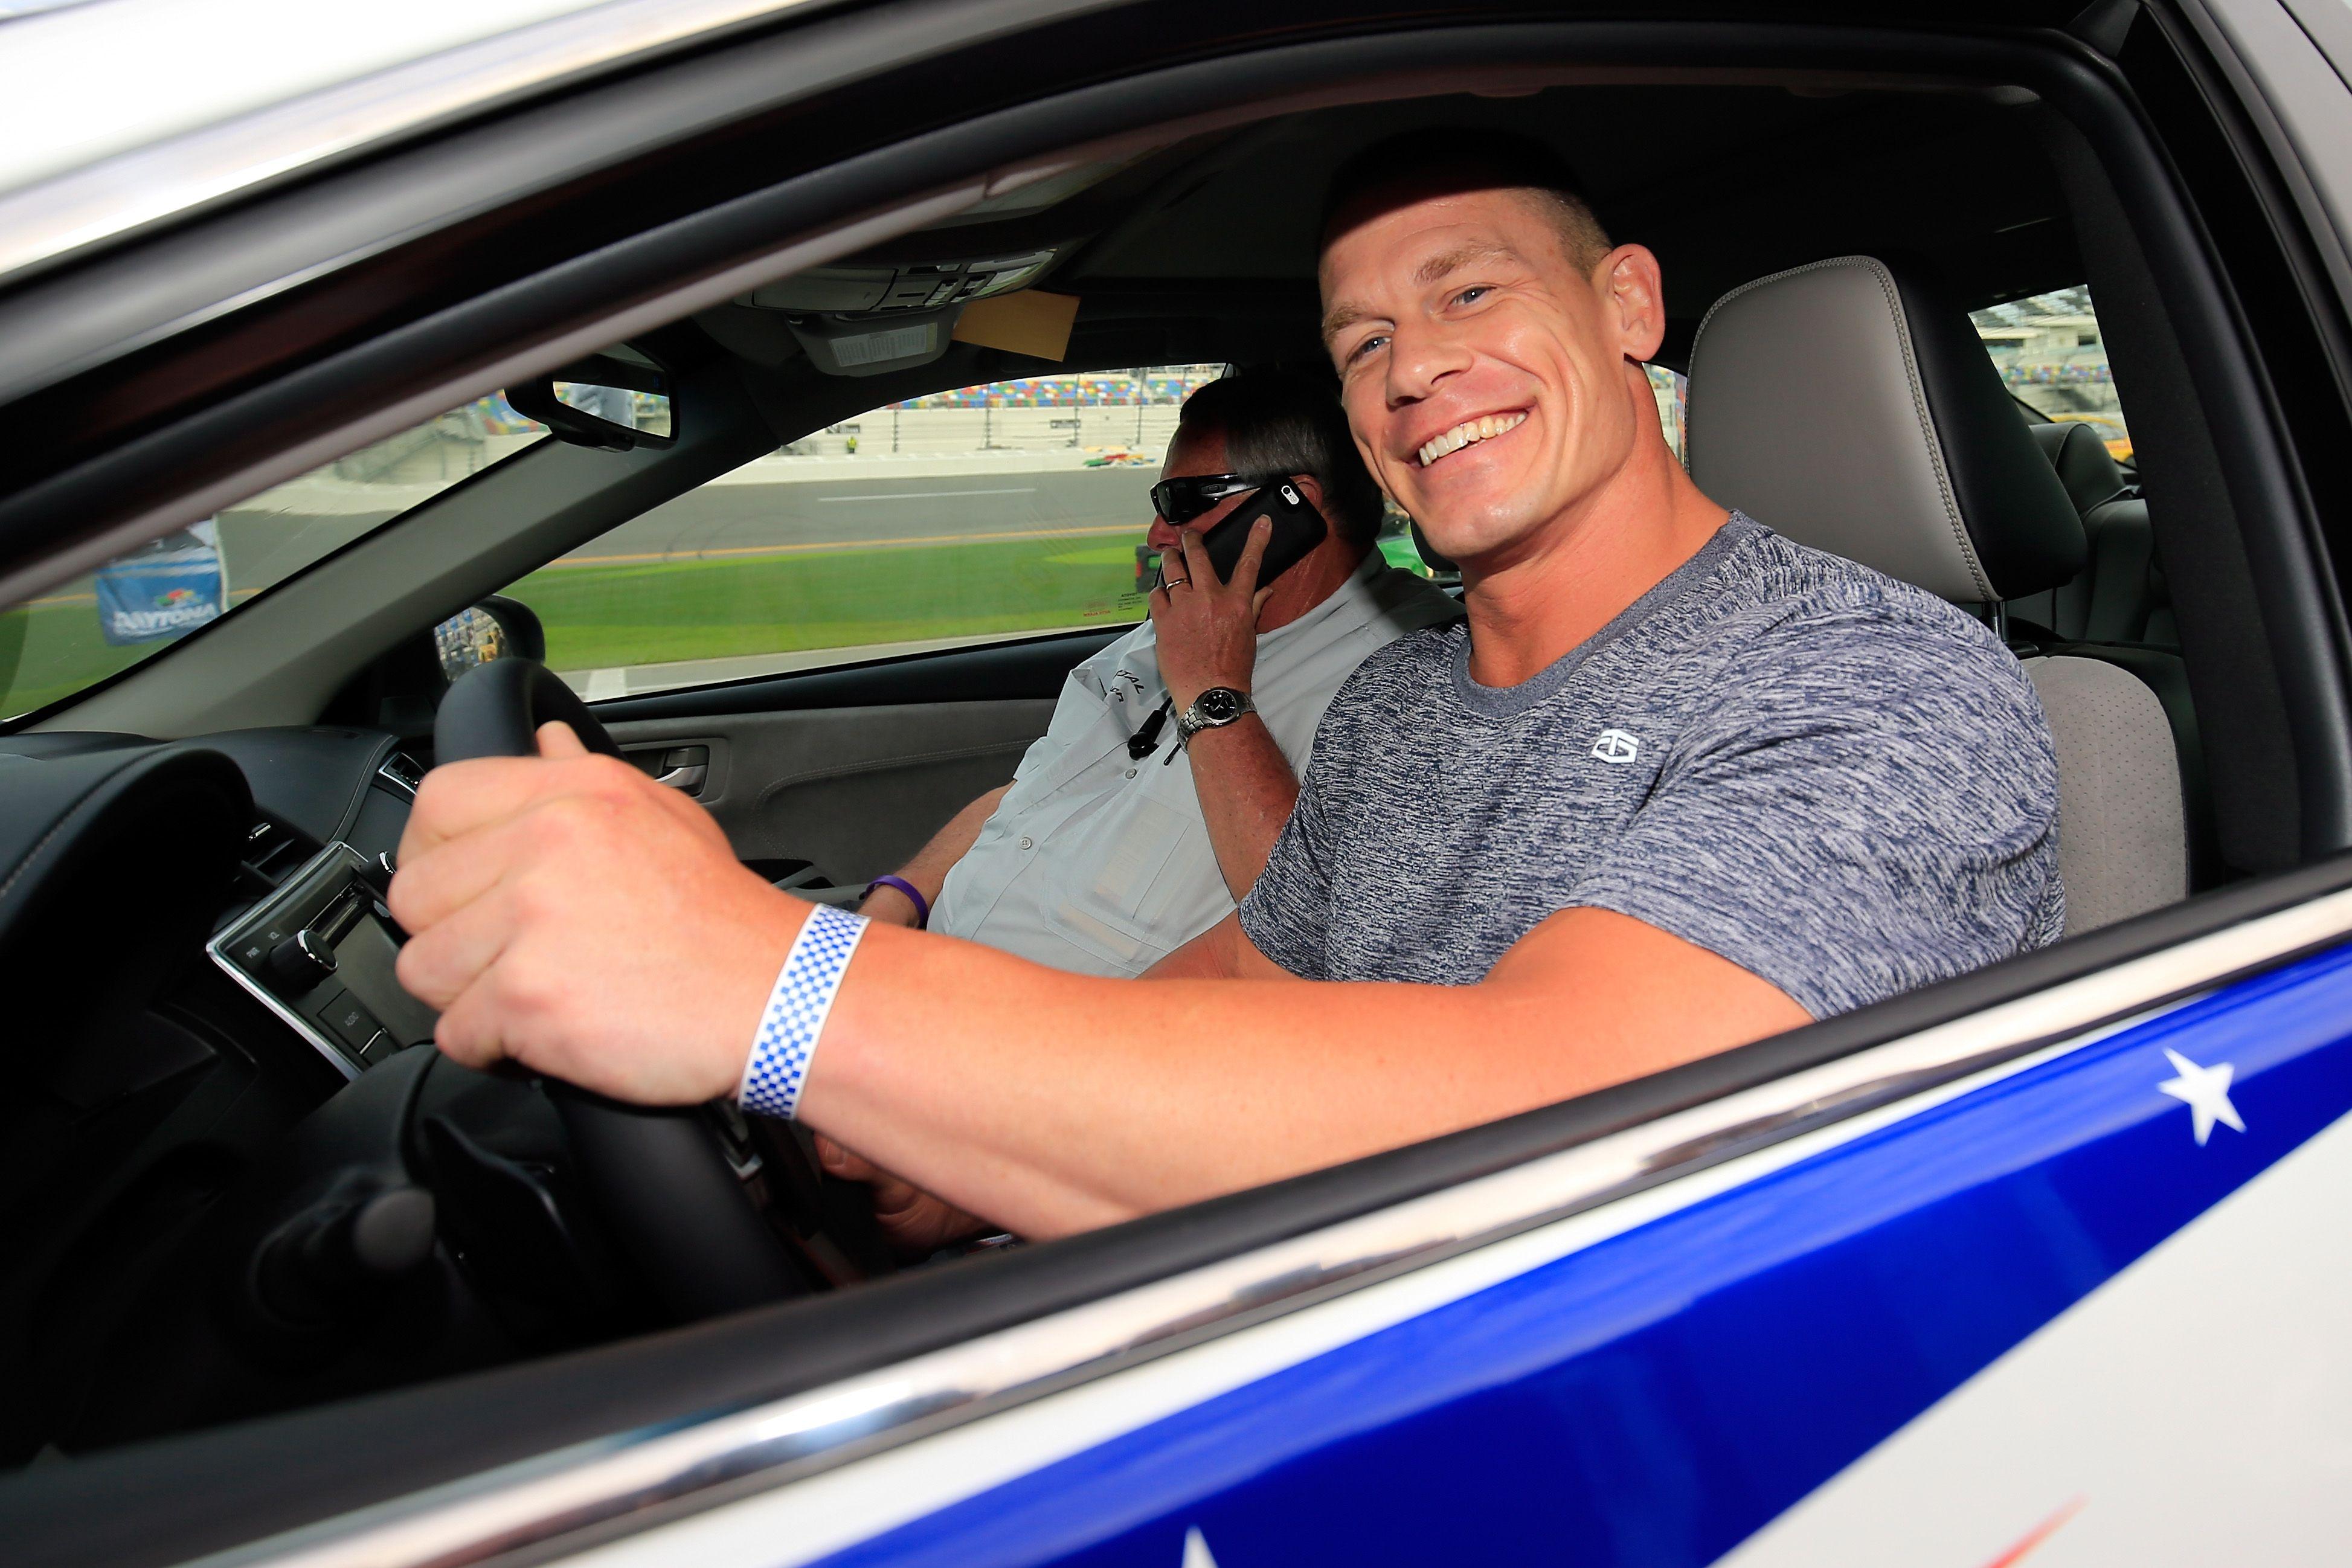 Fast & Furious 9 Movie Cast Adds John Cena - Reportedly